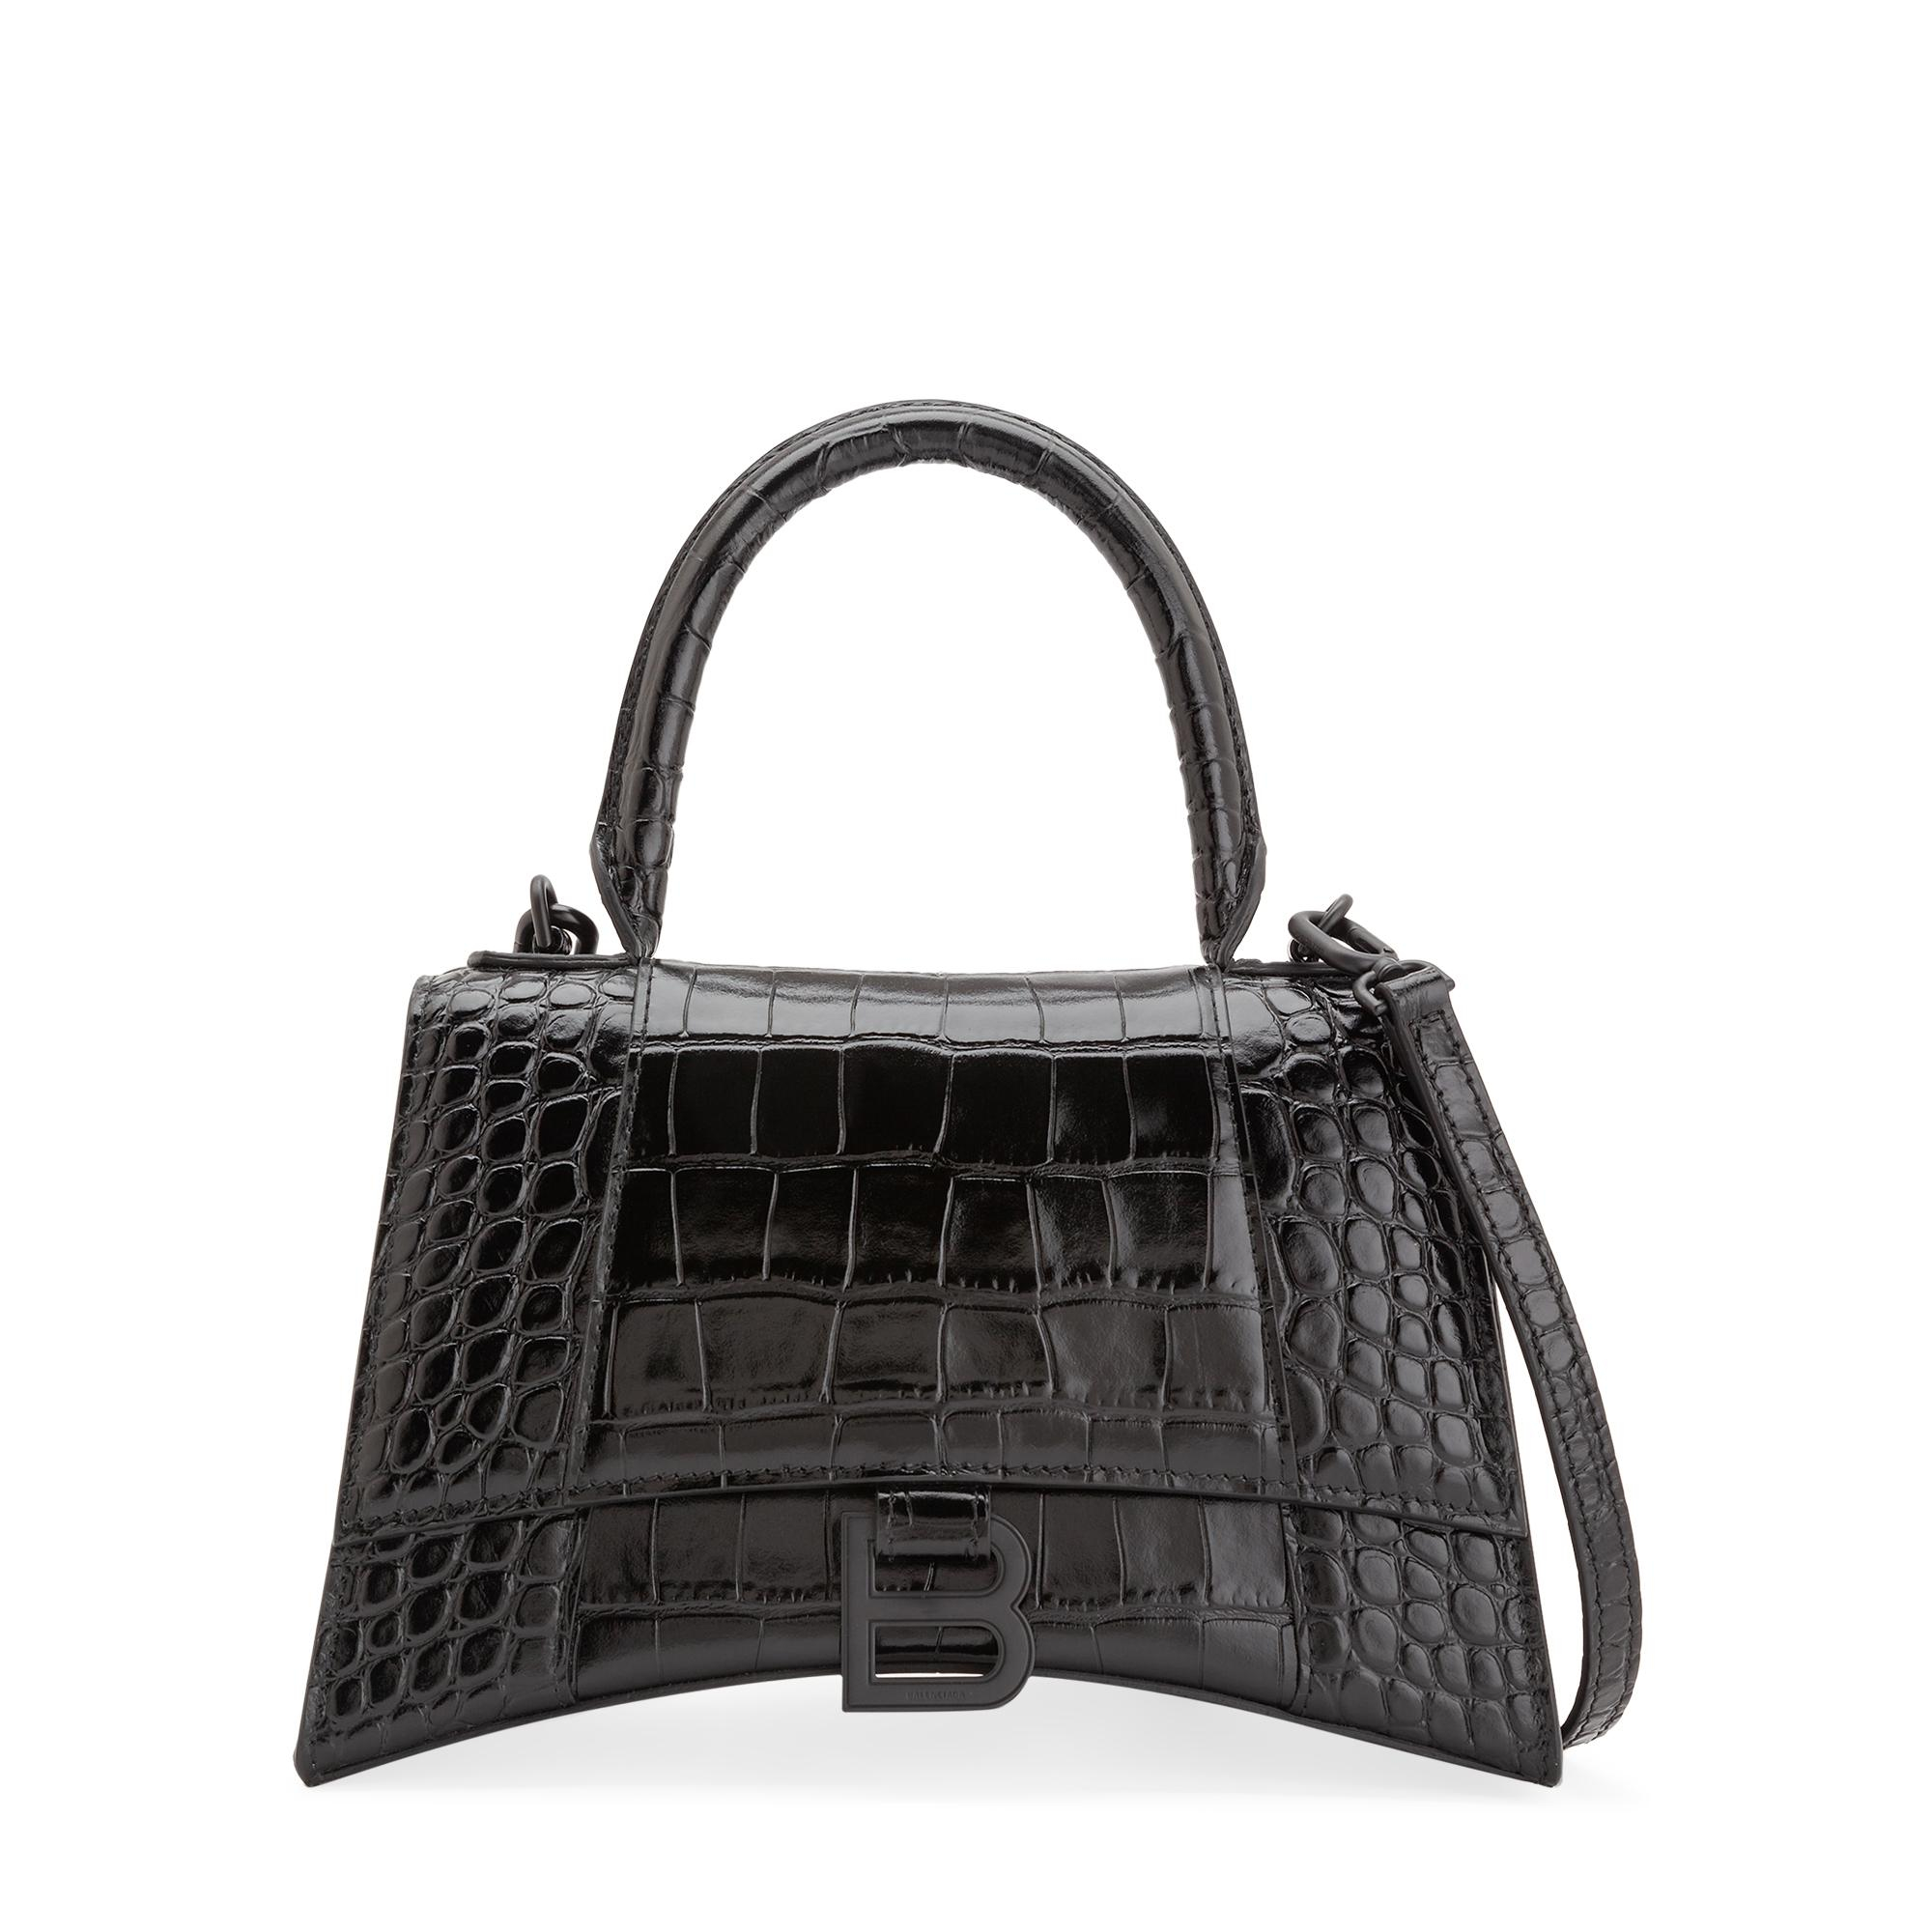 Hourglass S top-handle bag